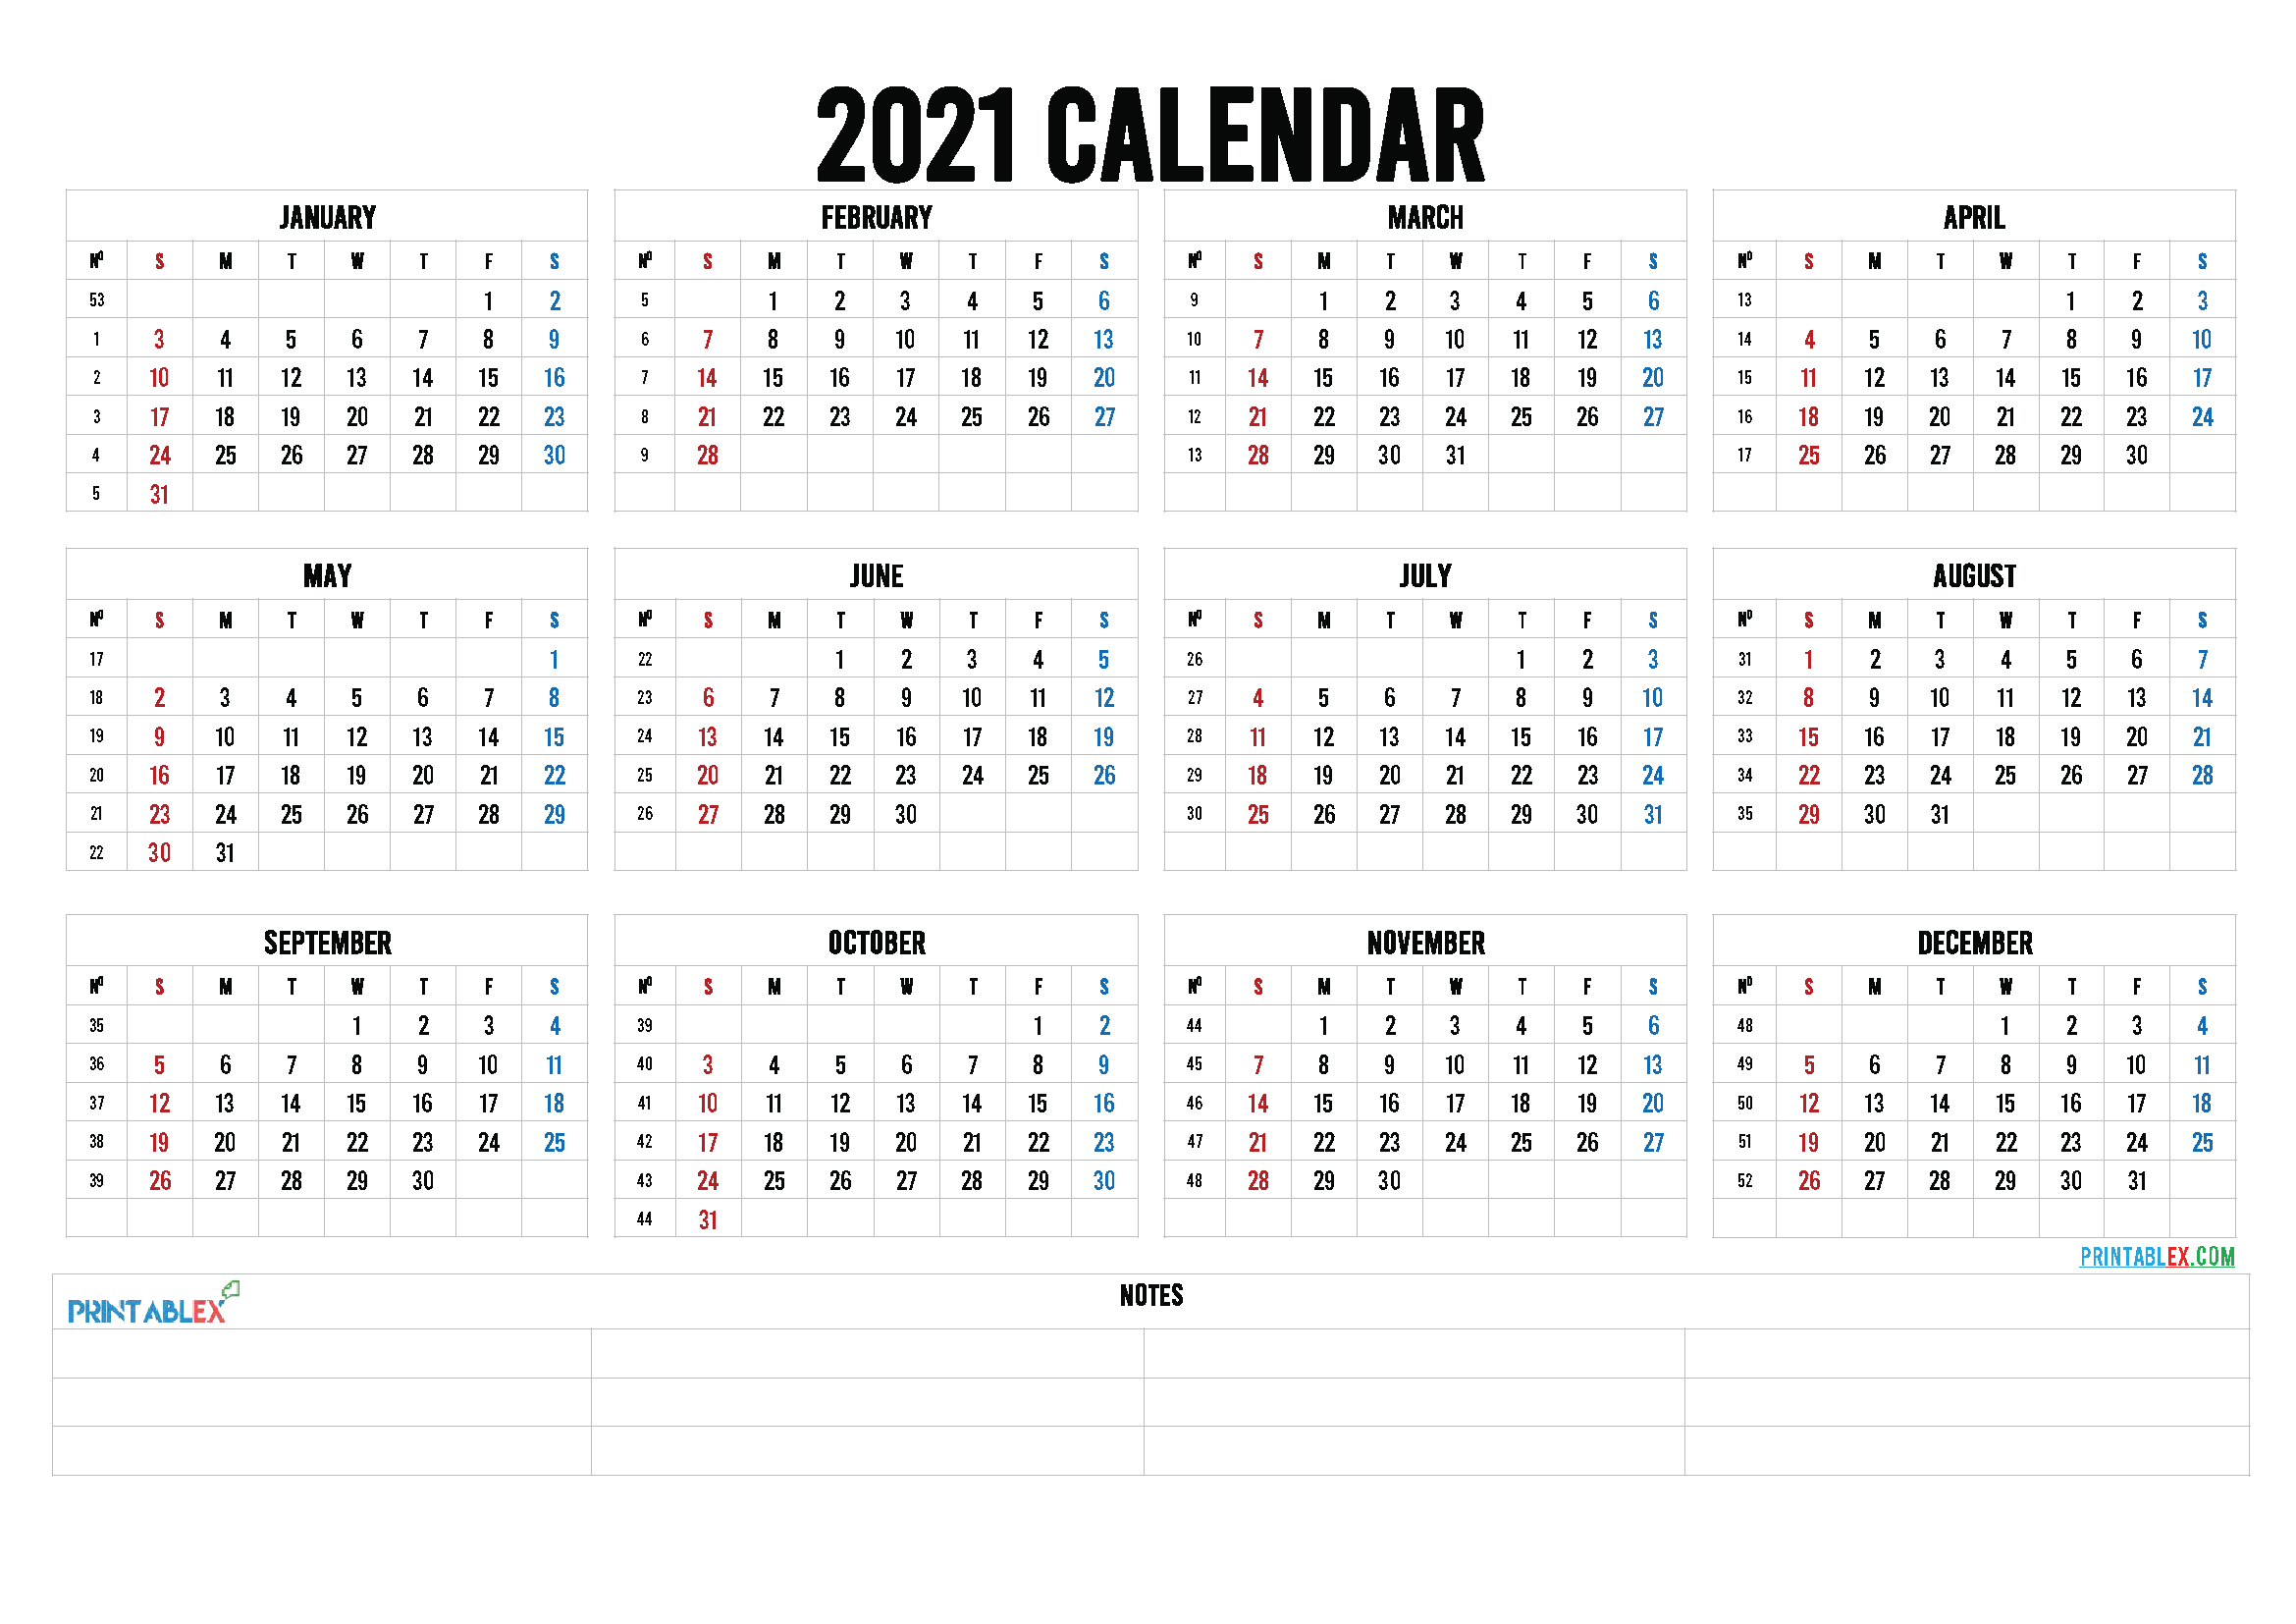 Free Editable Weekly 2021 Calendar : Custom Editable 2021 Calendar You Can Edit